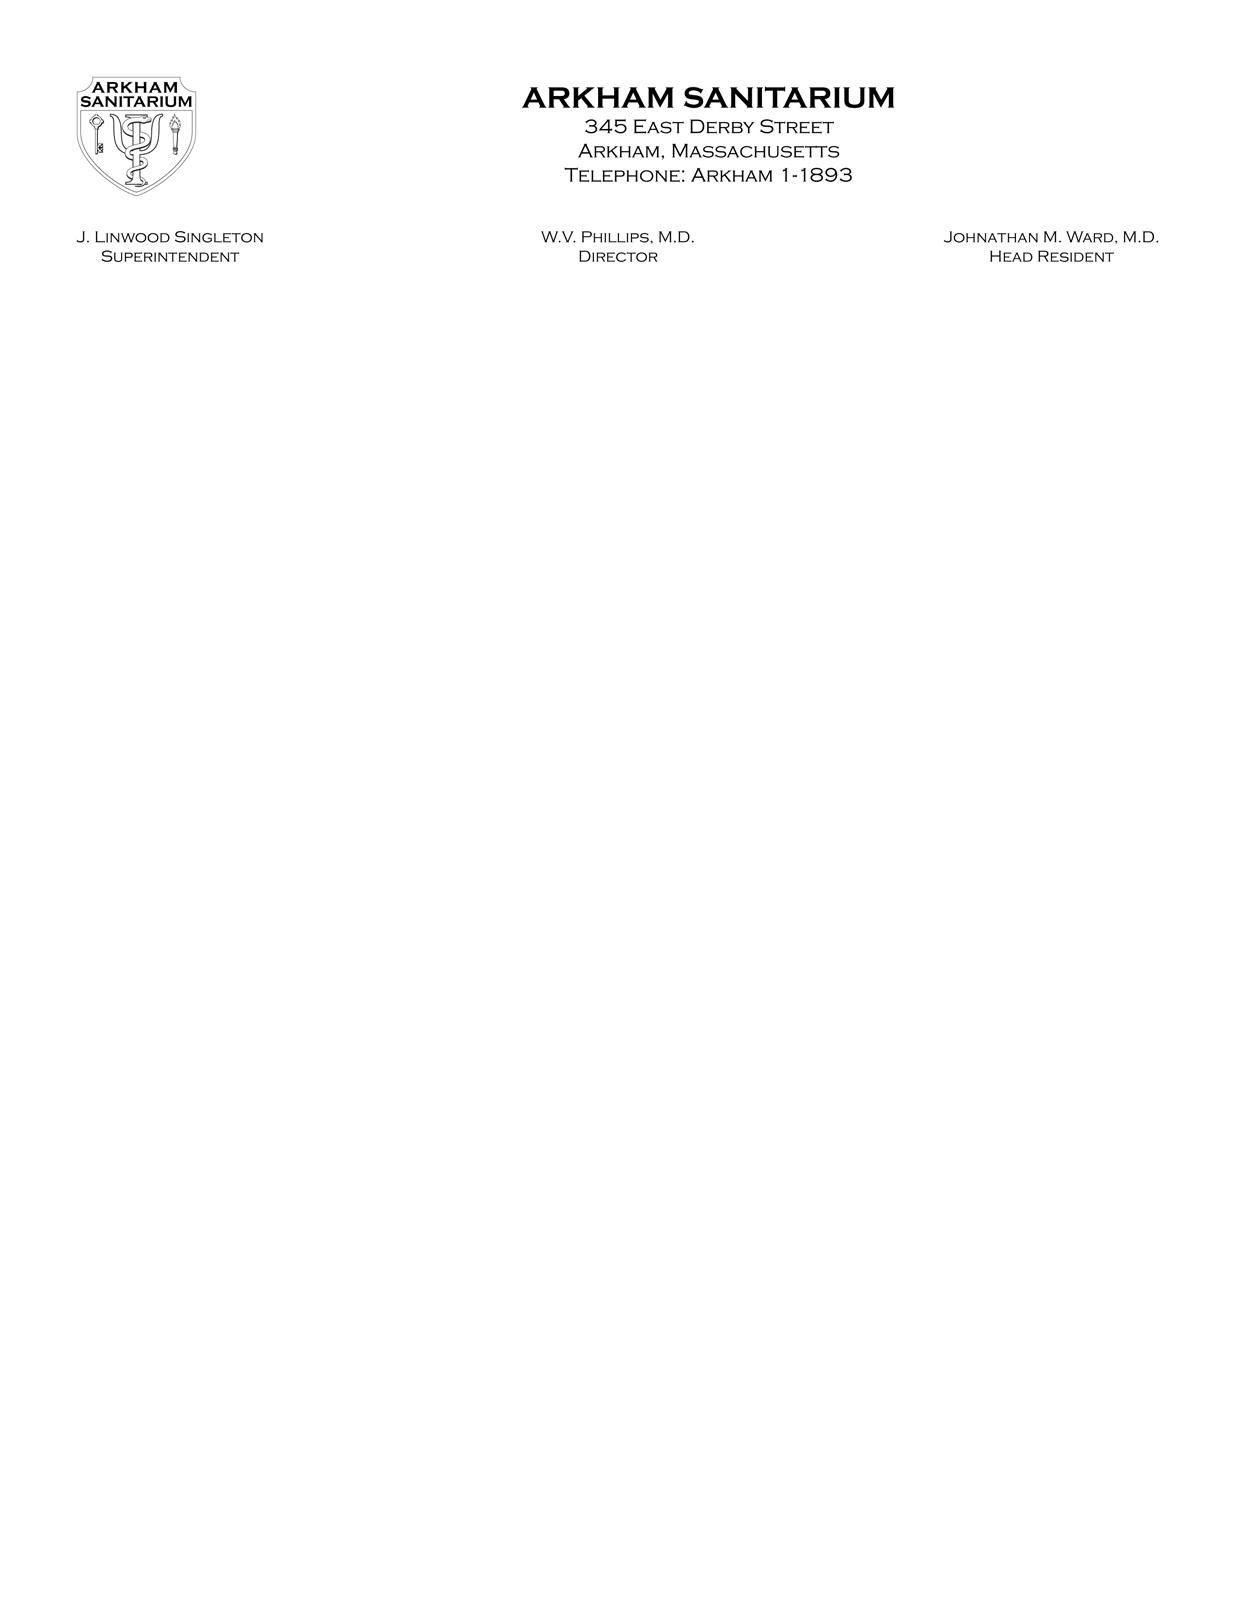 Stationery Design Templates Psd